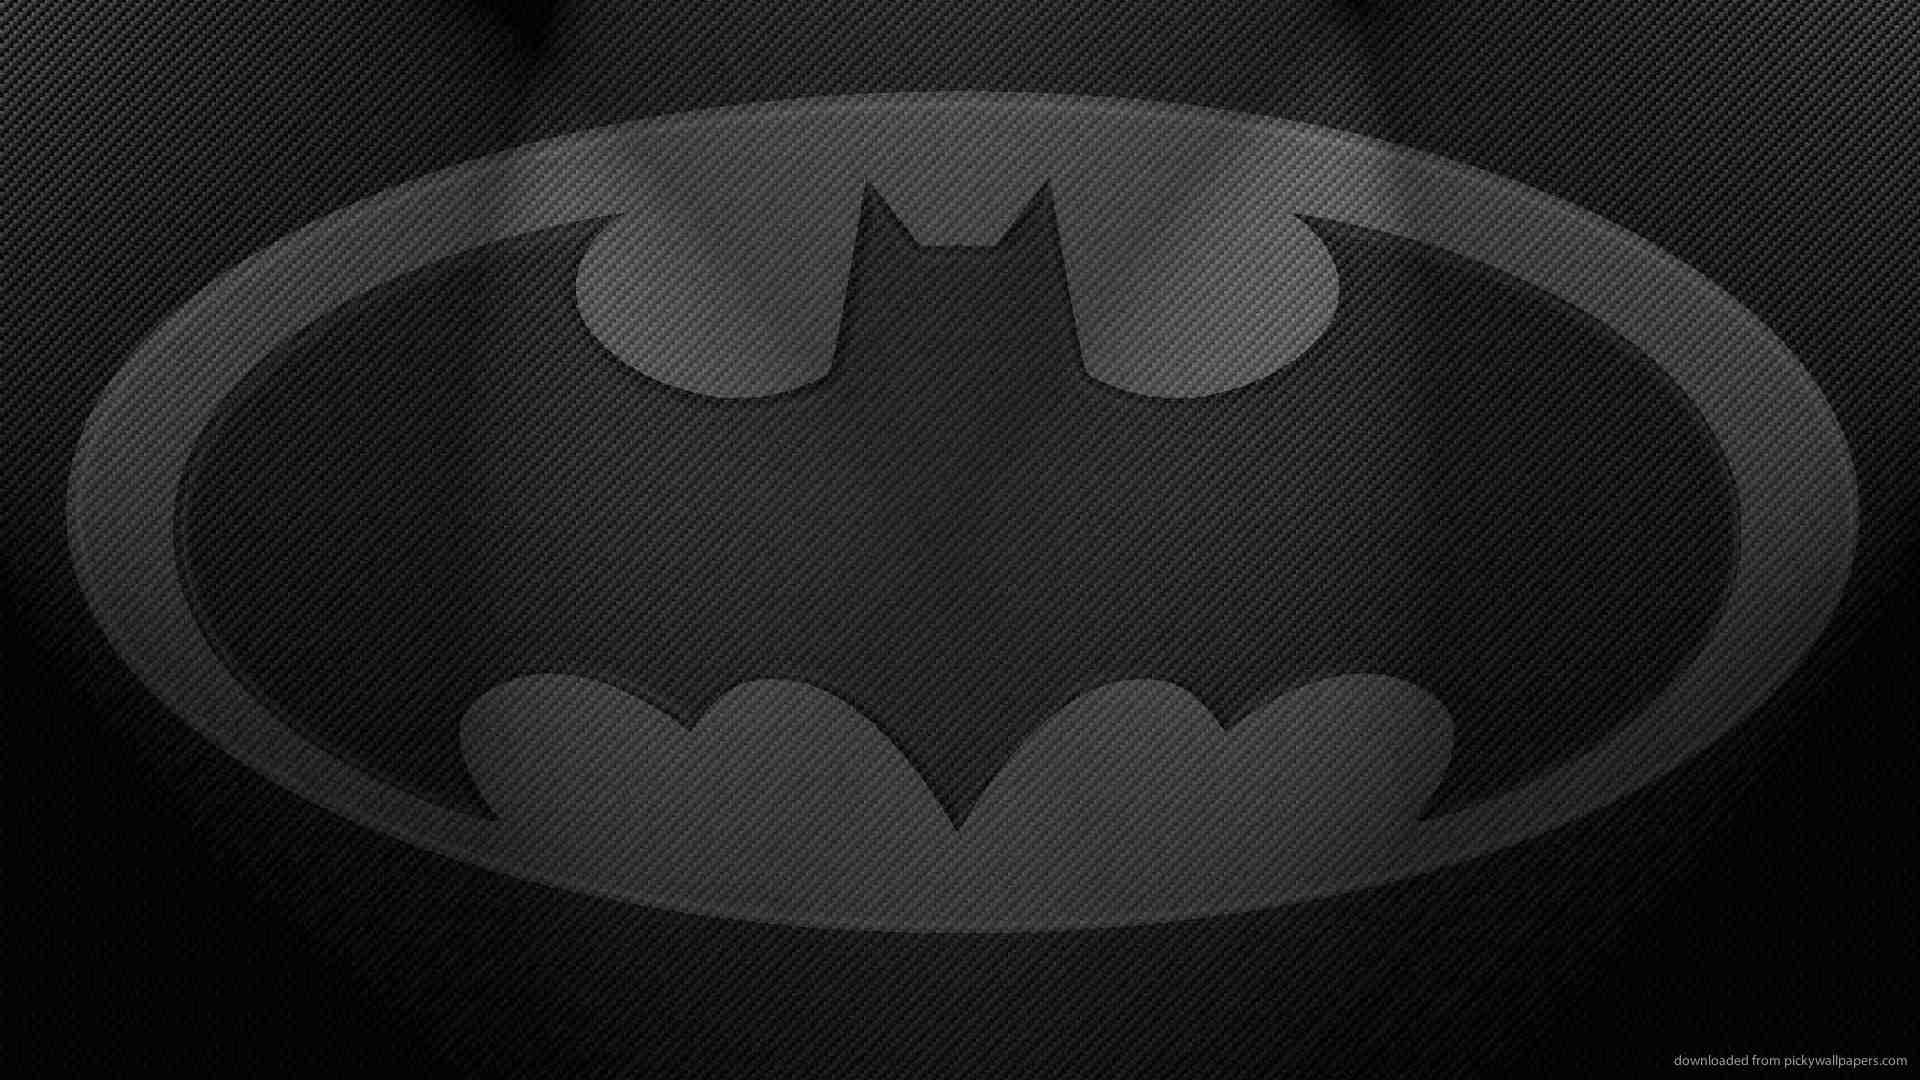 Batman logo wallpaper movies tvshows   986115 1920x1080